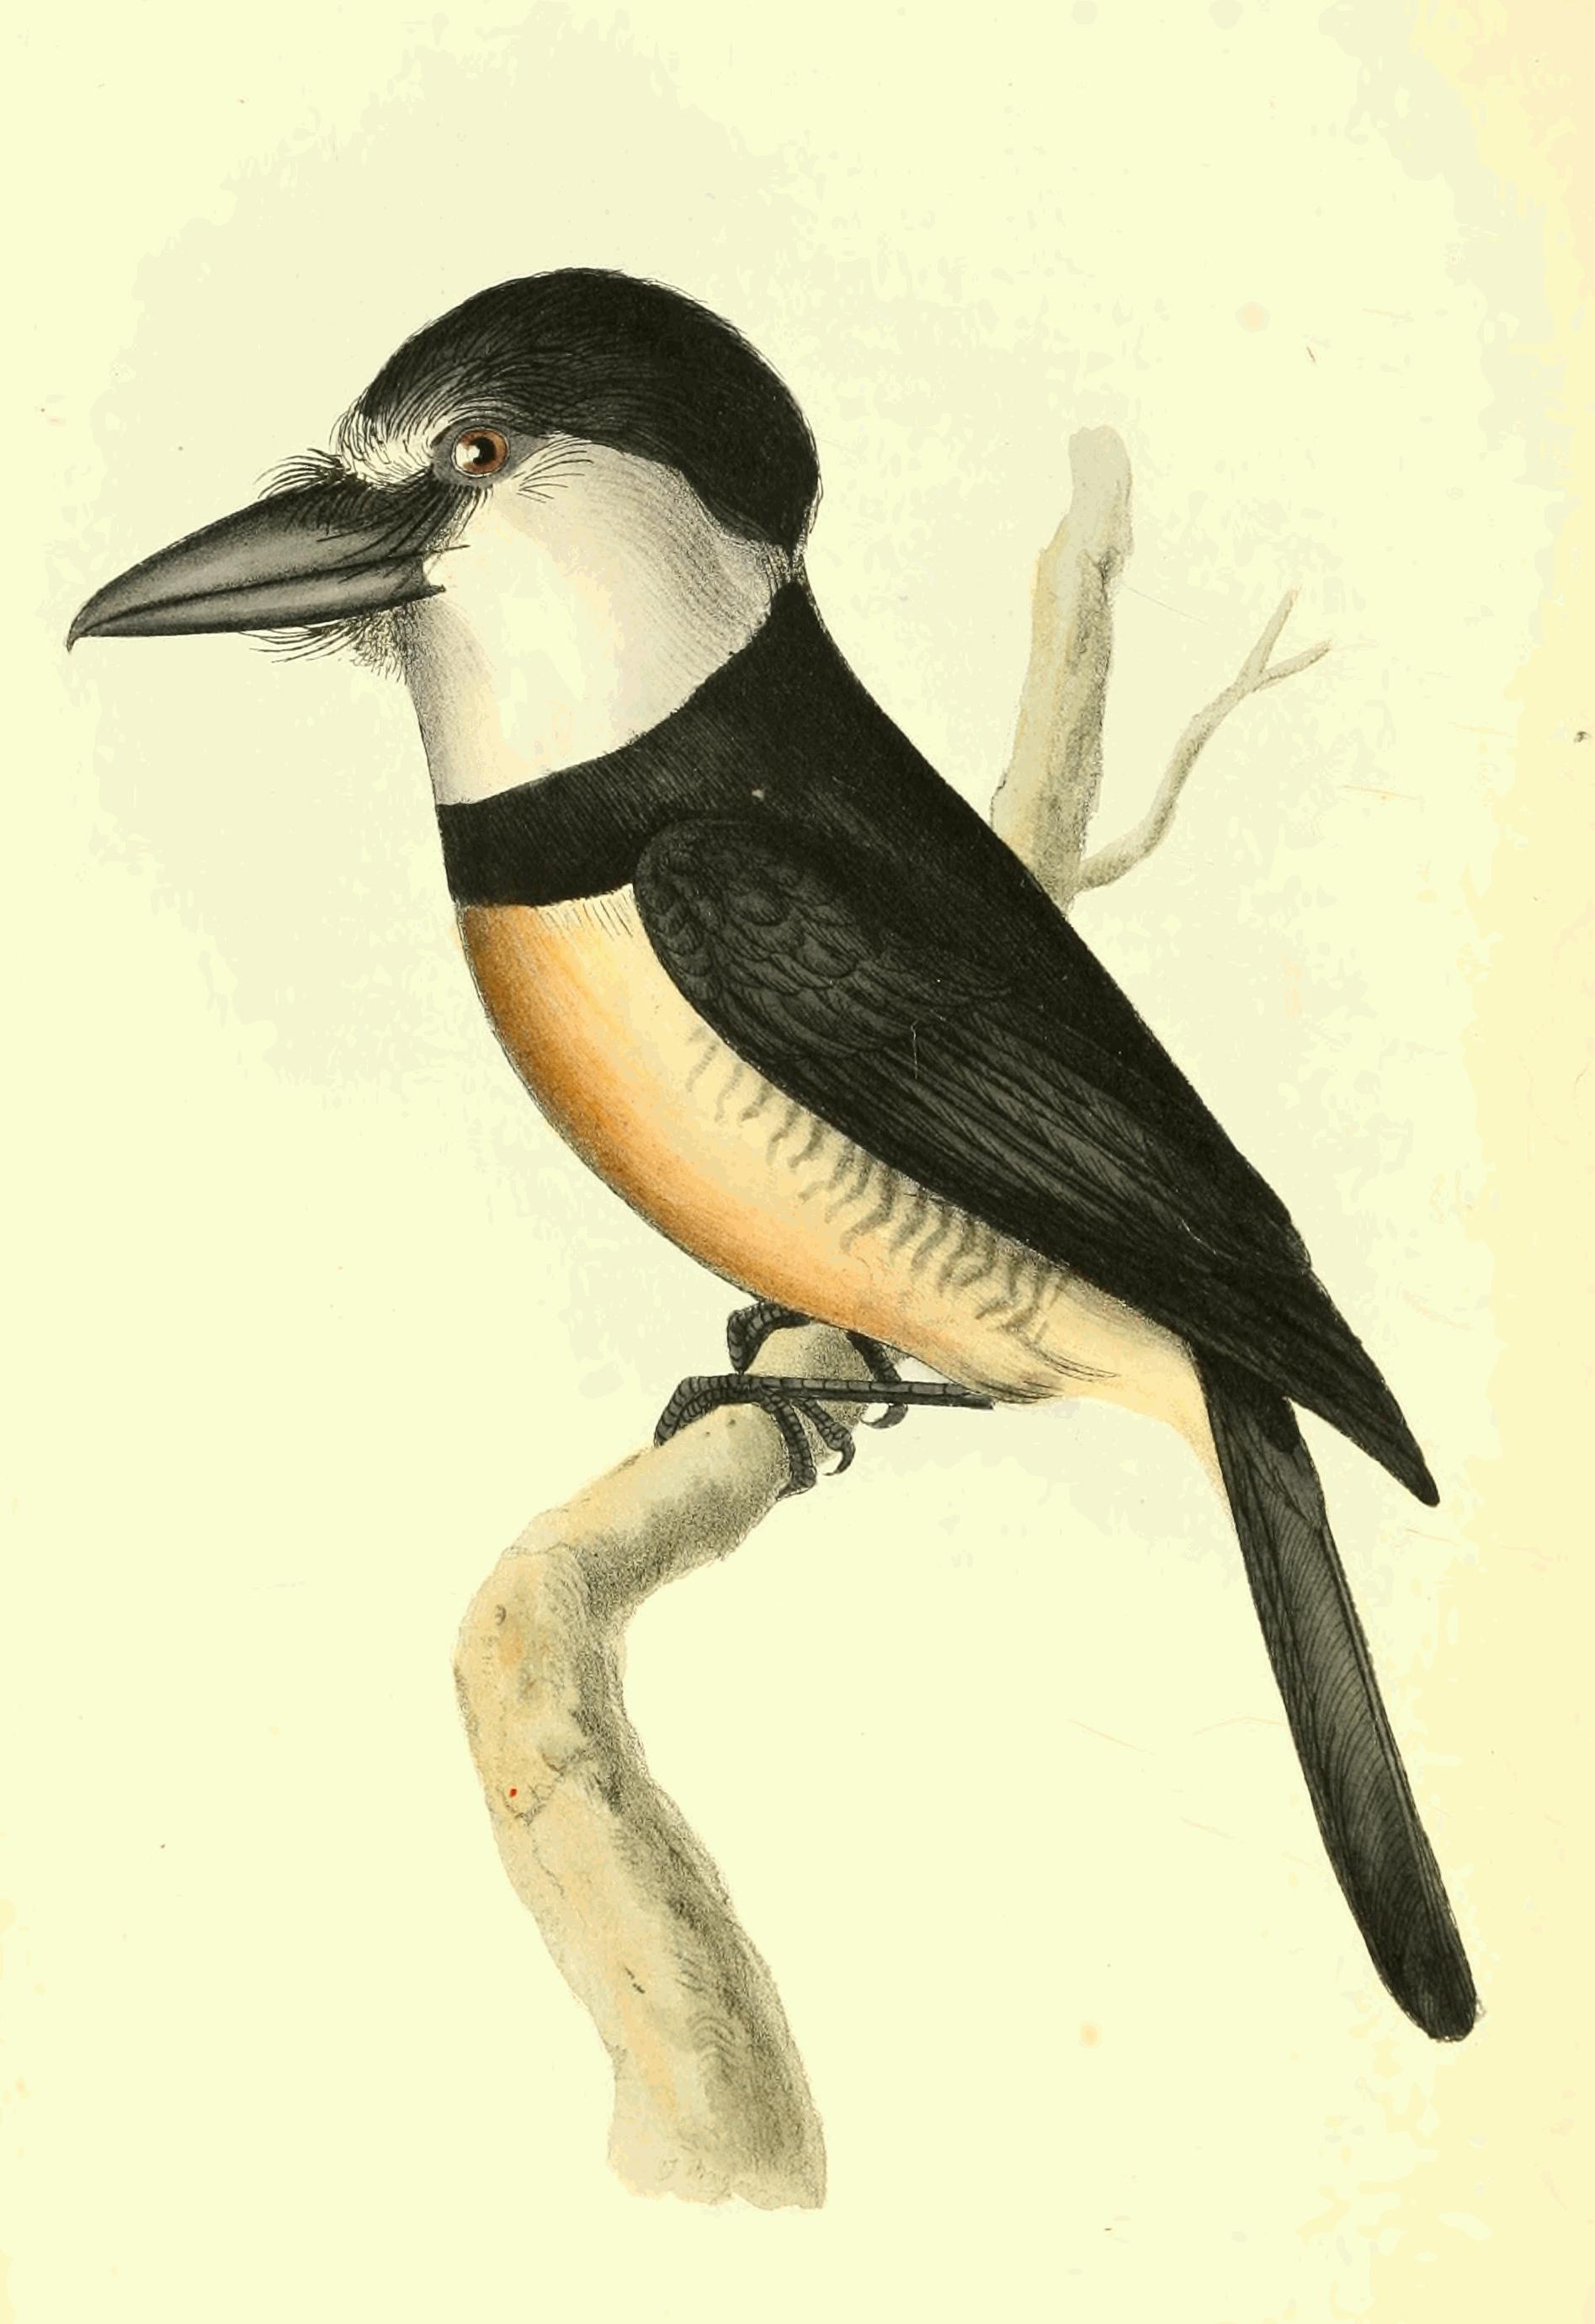 Image of Notharchus macrorhynchos